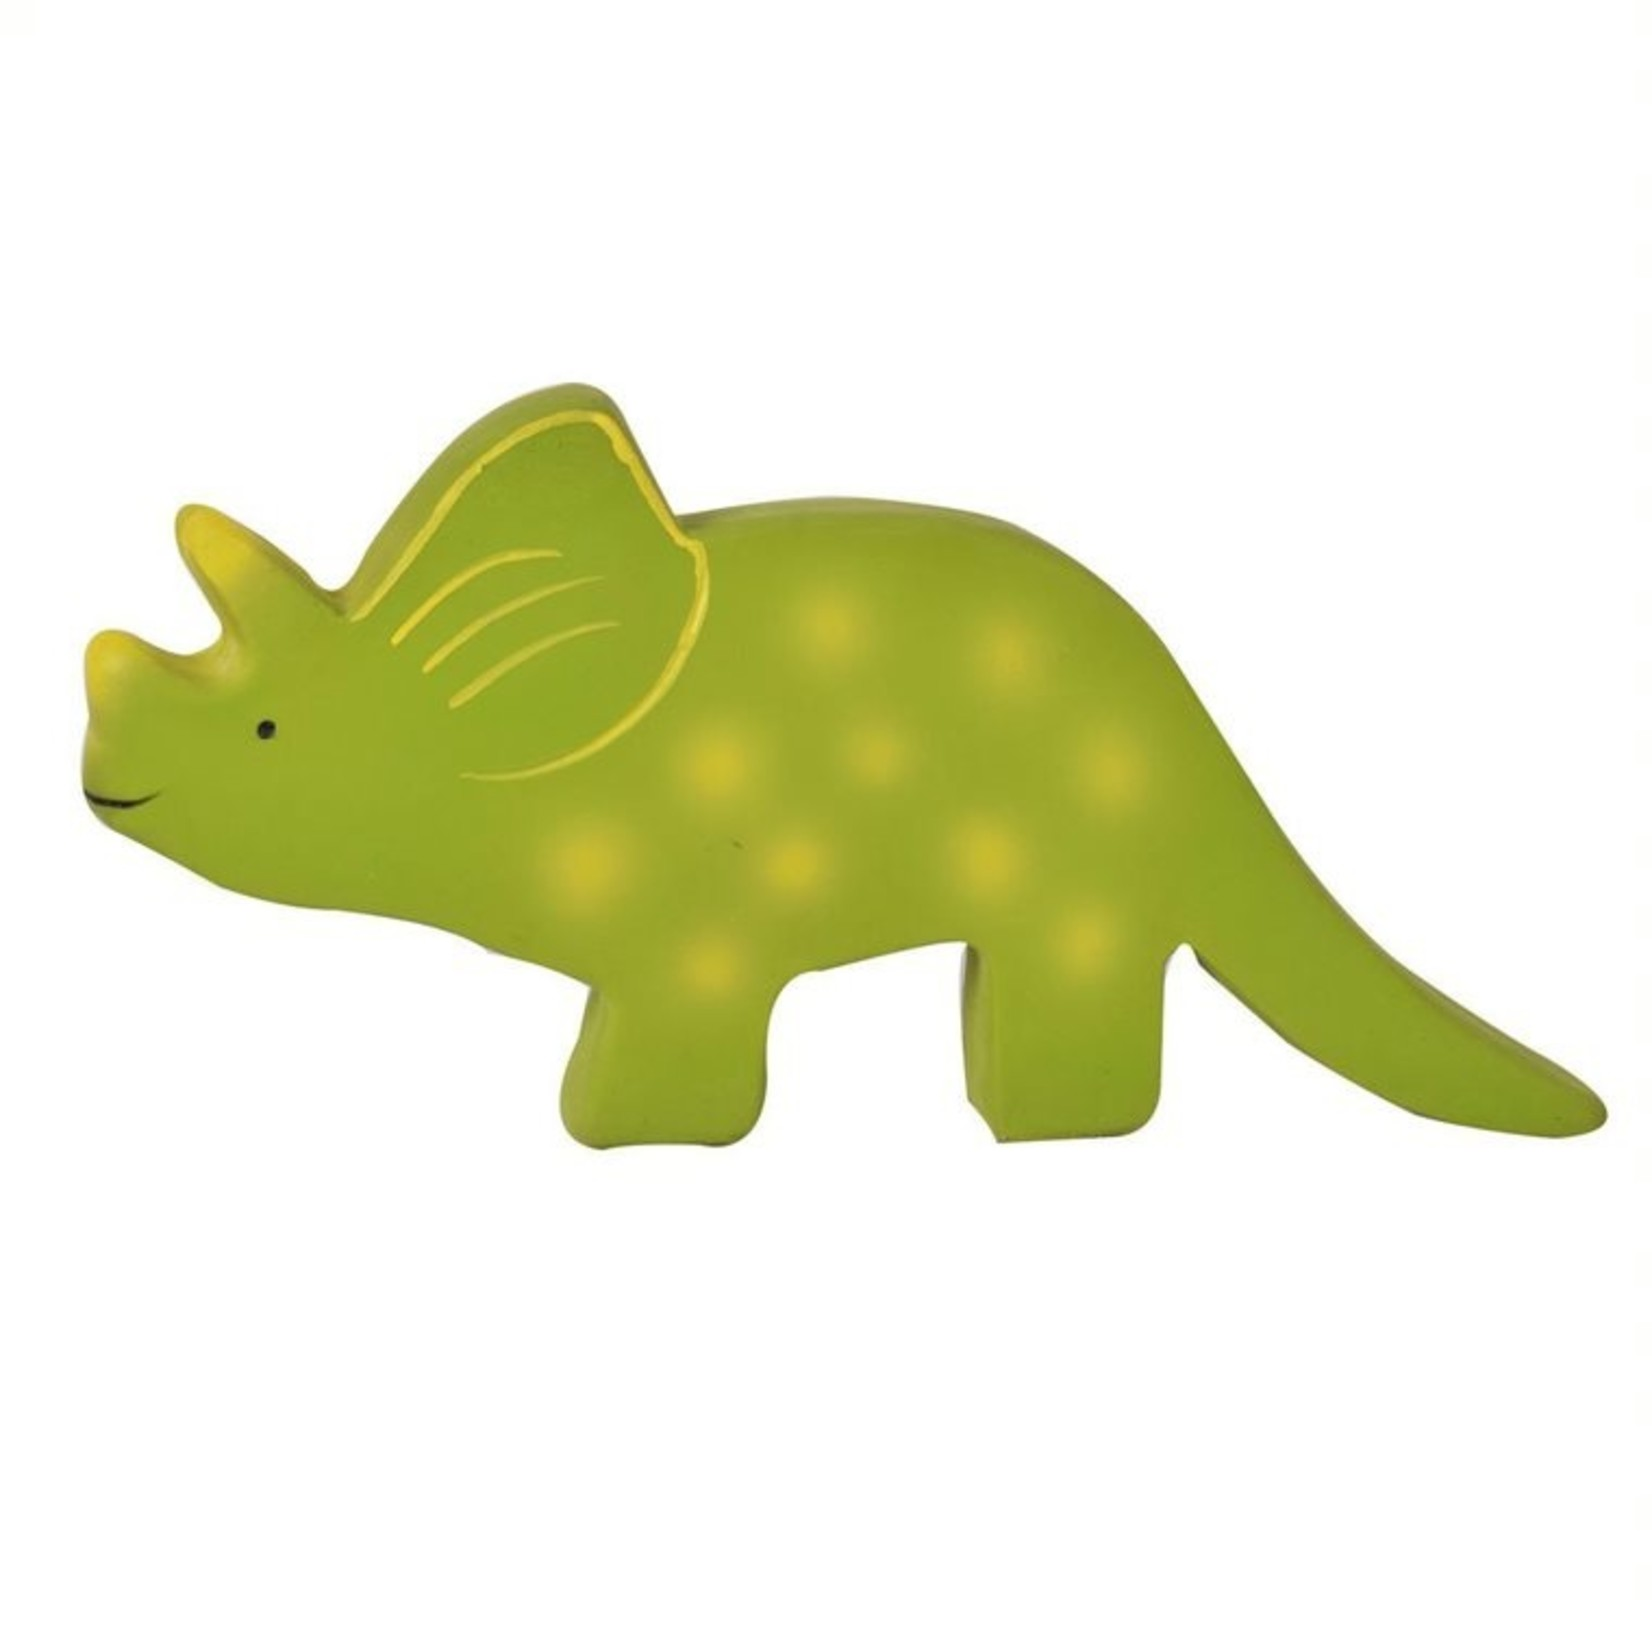 Tikiri Collection Baby Stegosaurus Rubber Toy